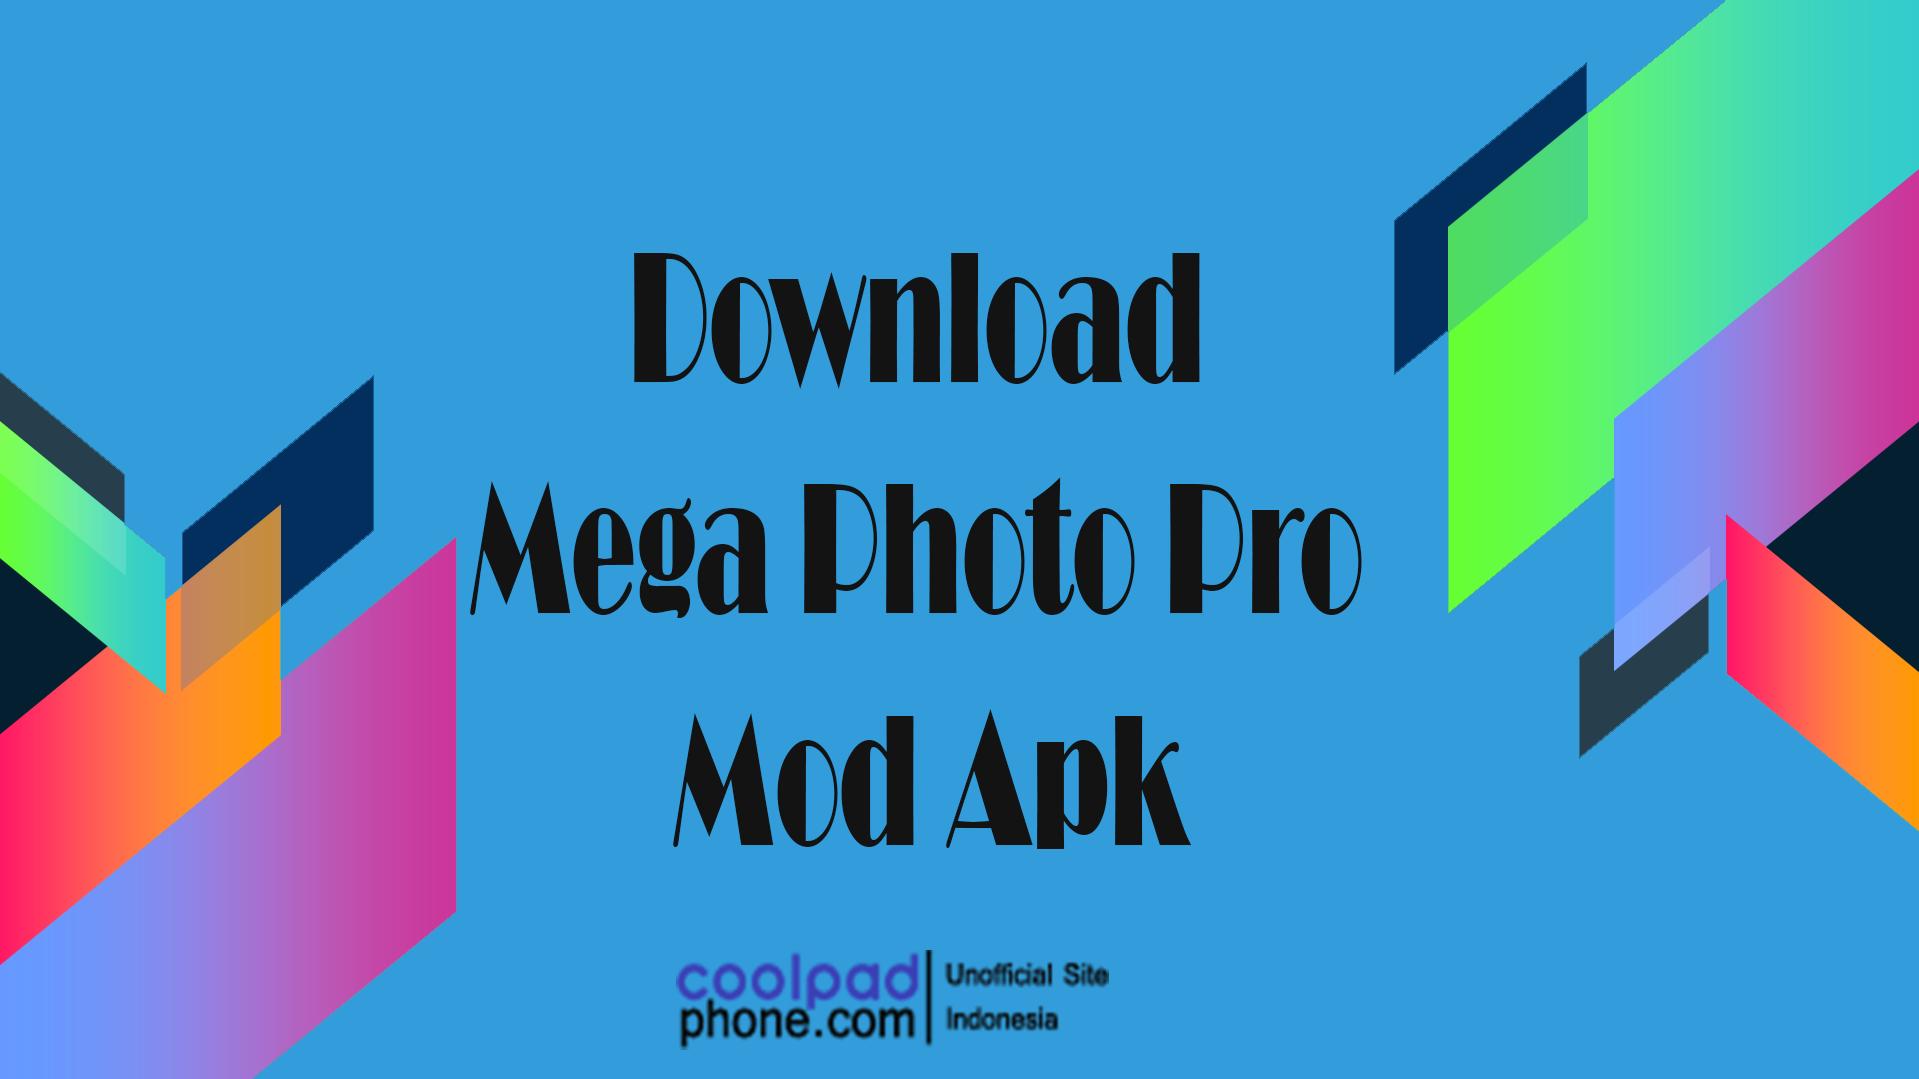 Download-Mega-Photo-Pro-Mod-Apk